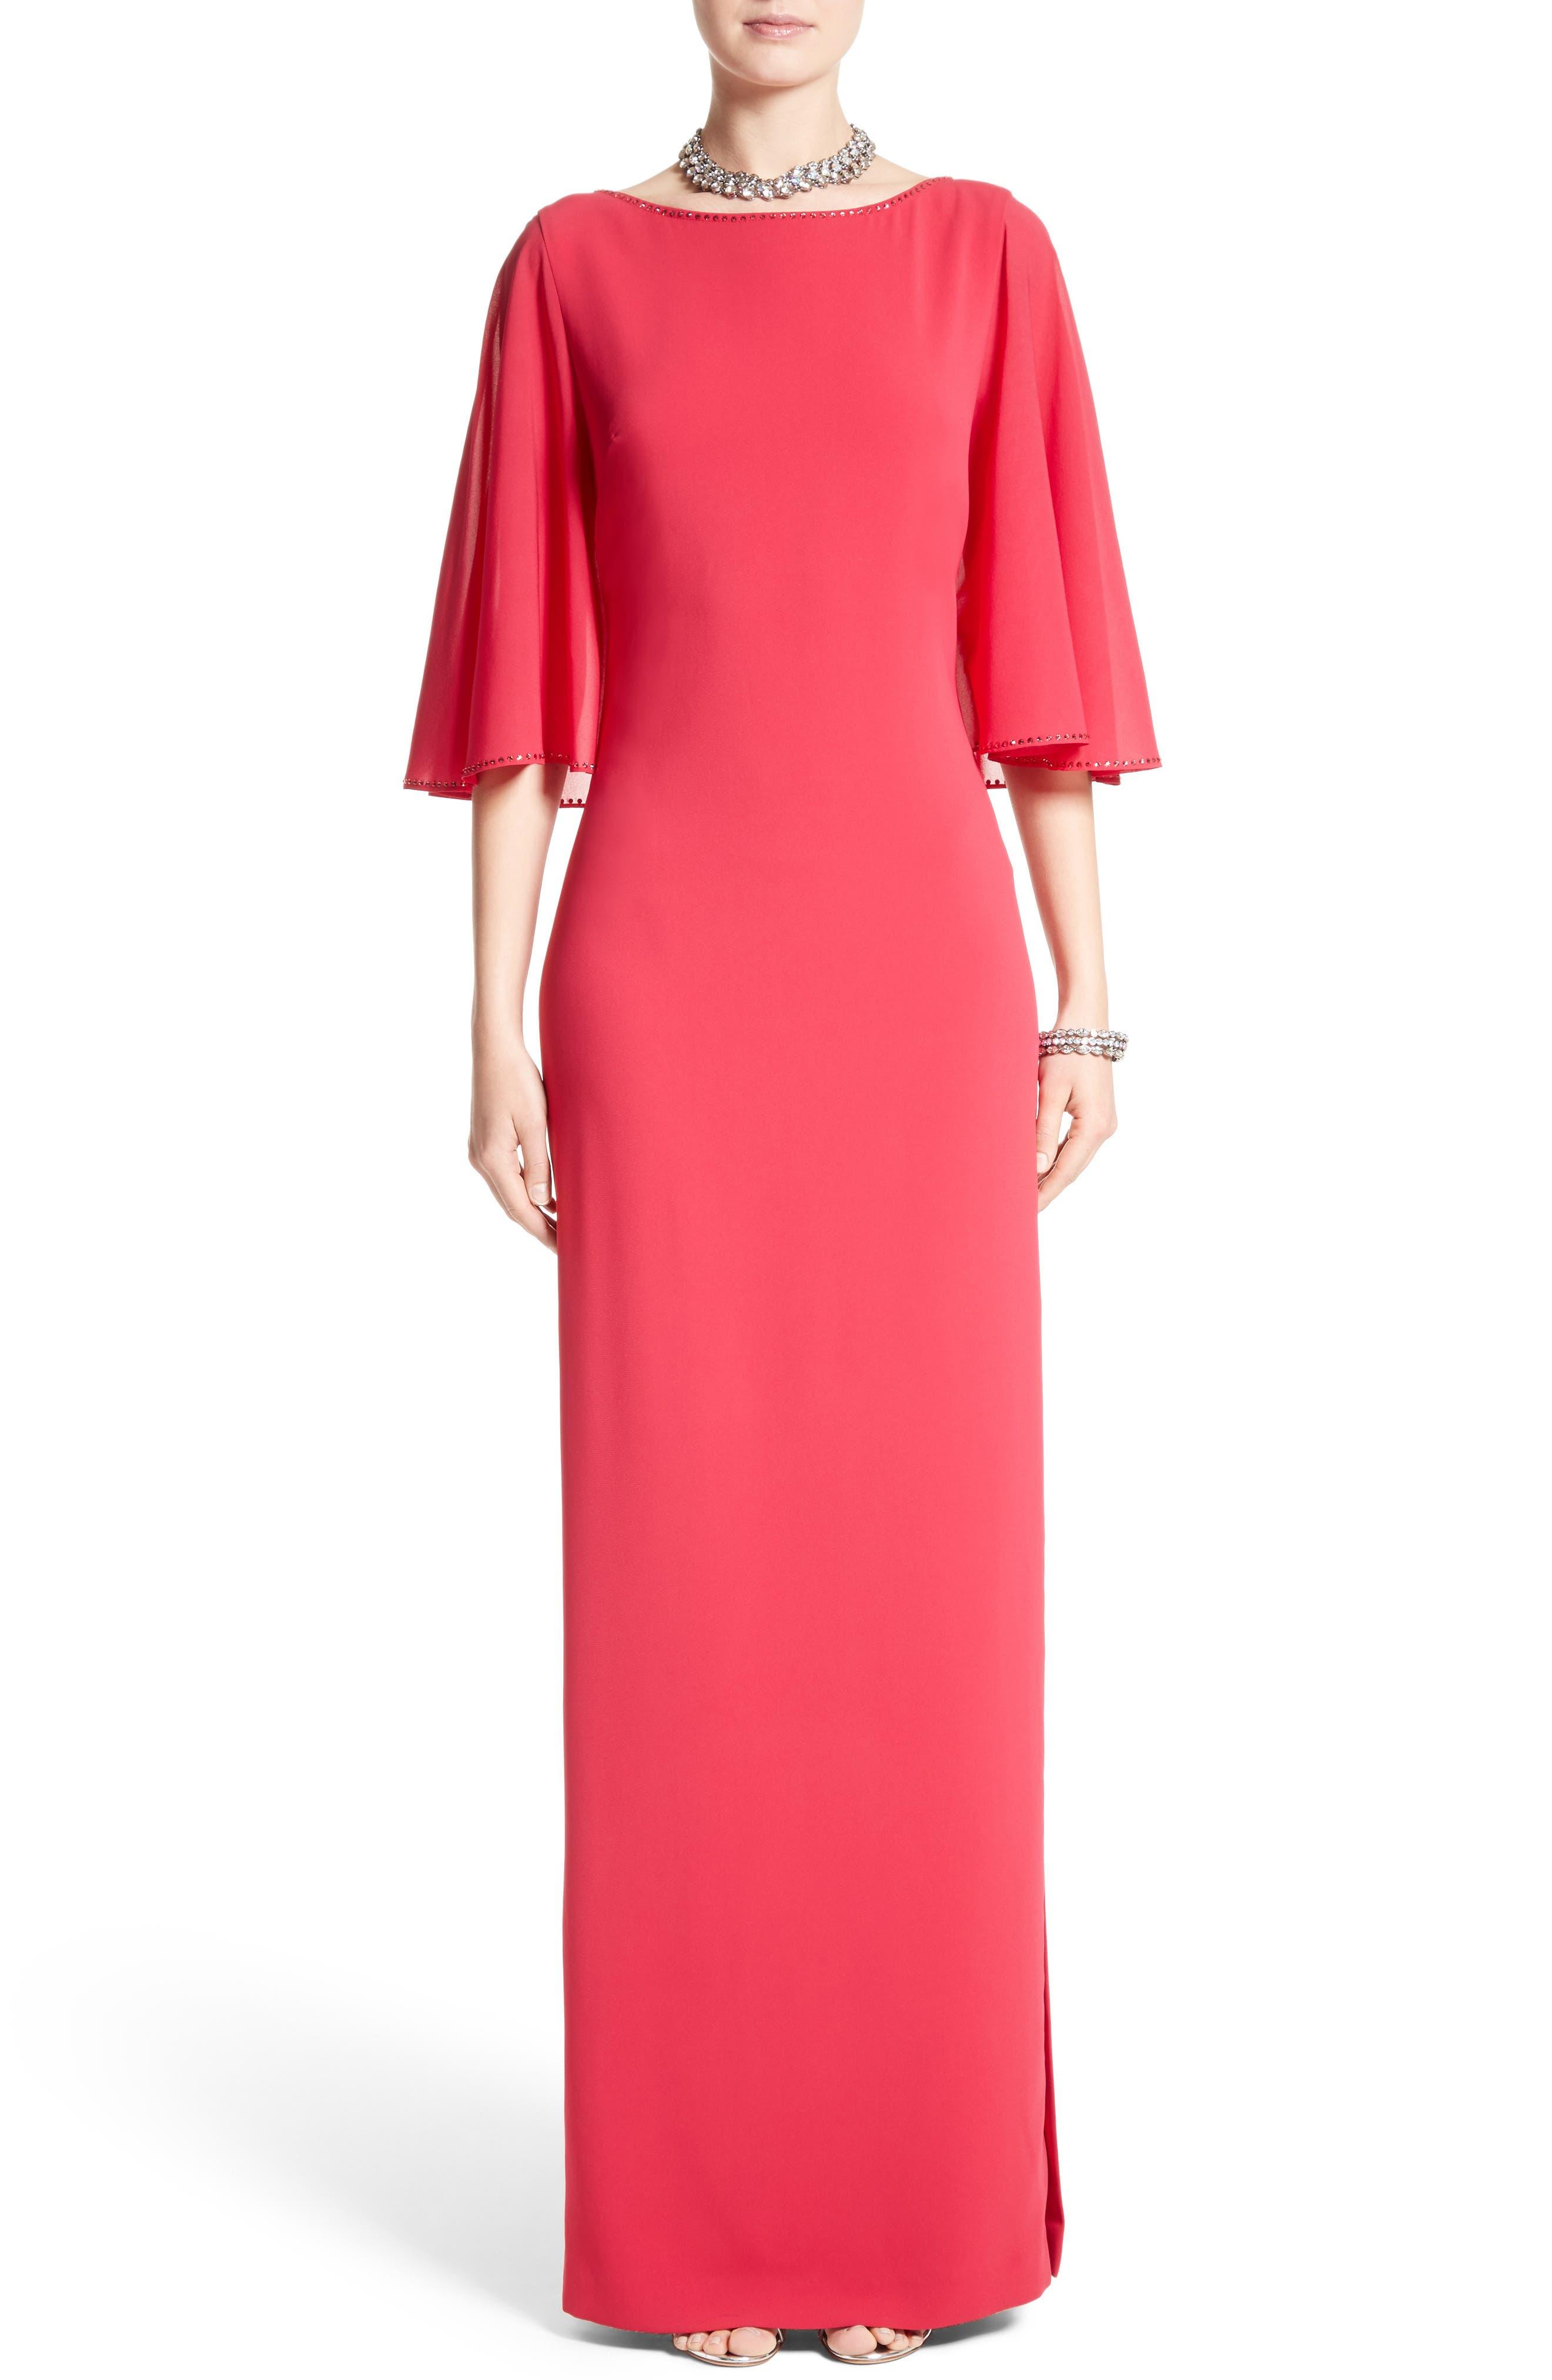 Alternate Image 1 Selected - St. John Evening Embellished Stretch Cady Cape Back Gown